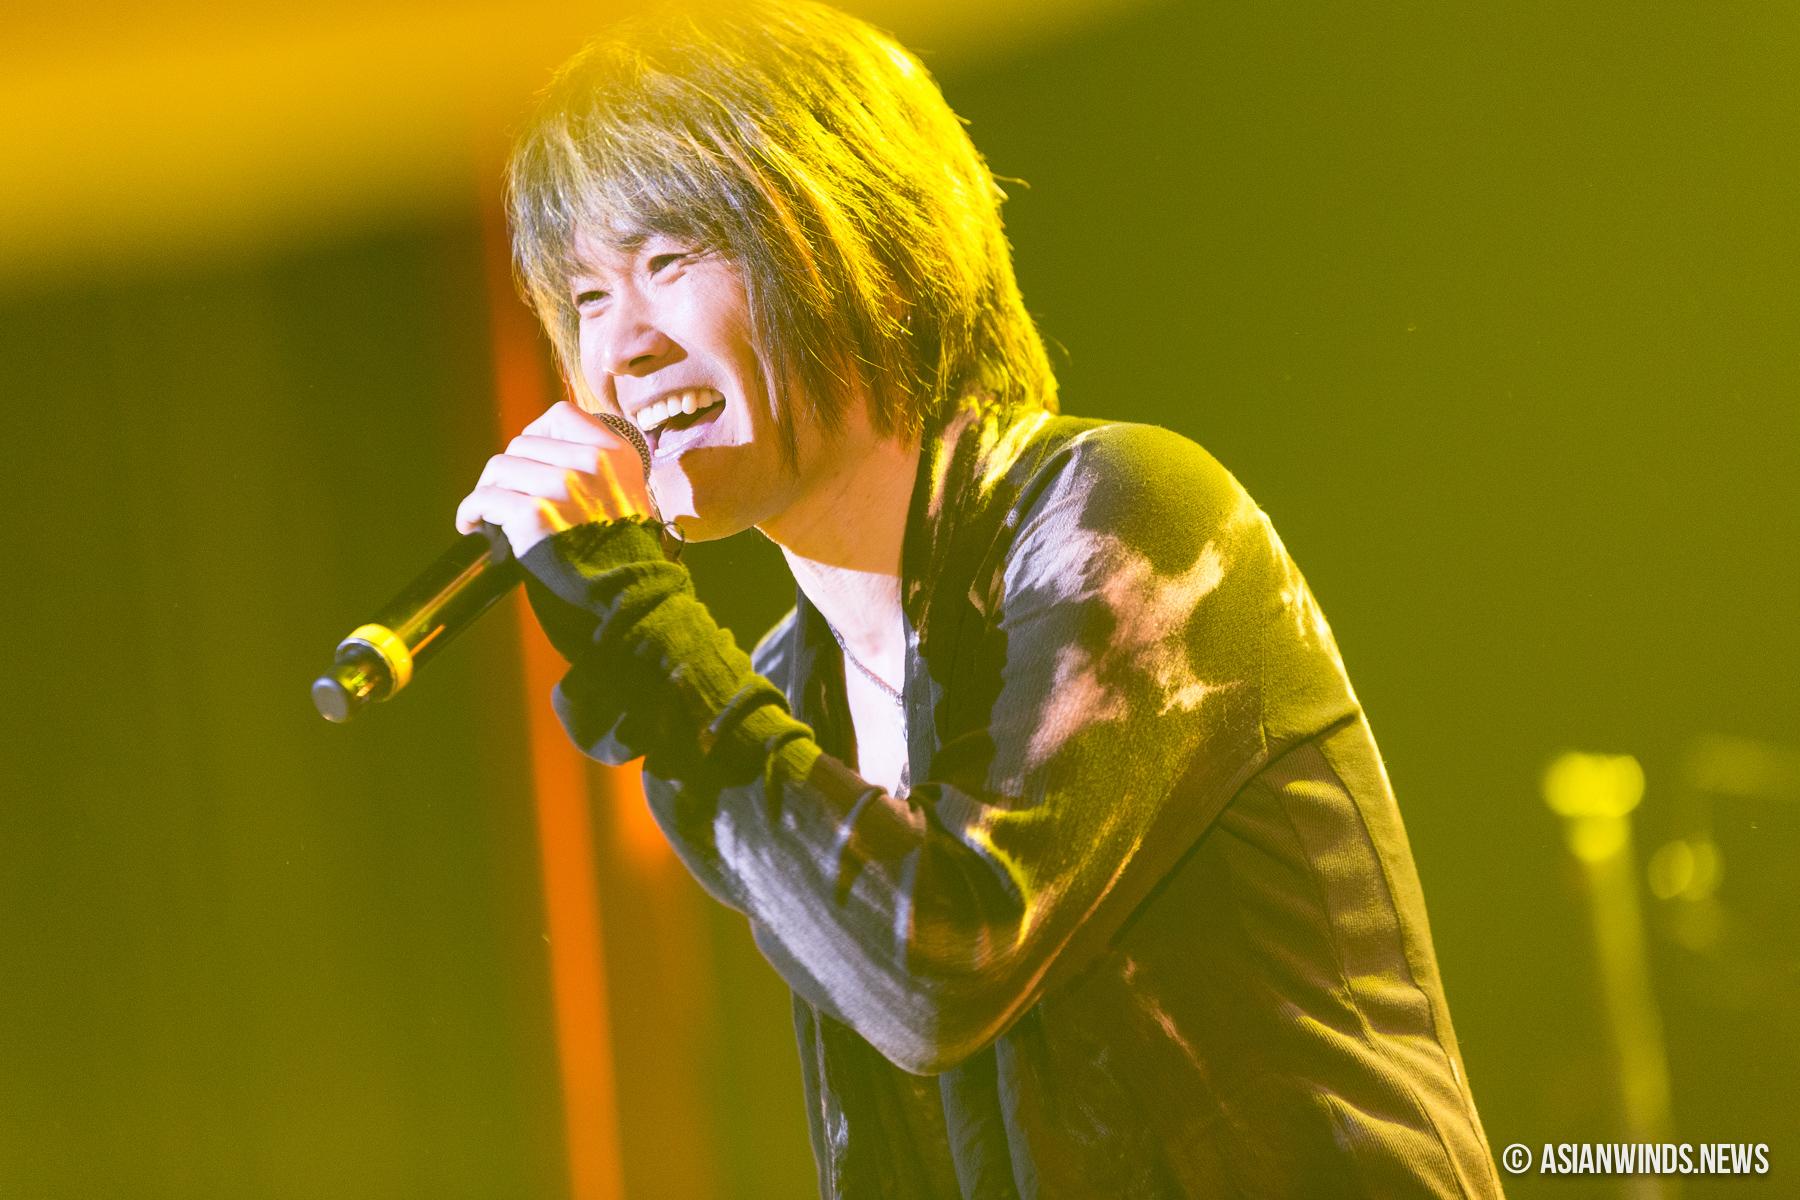 Hiroshi Kitadani (JAM Project)